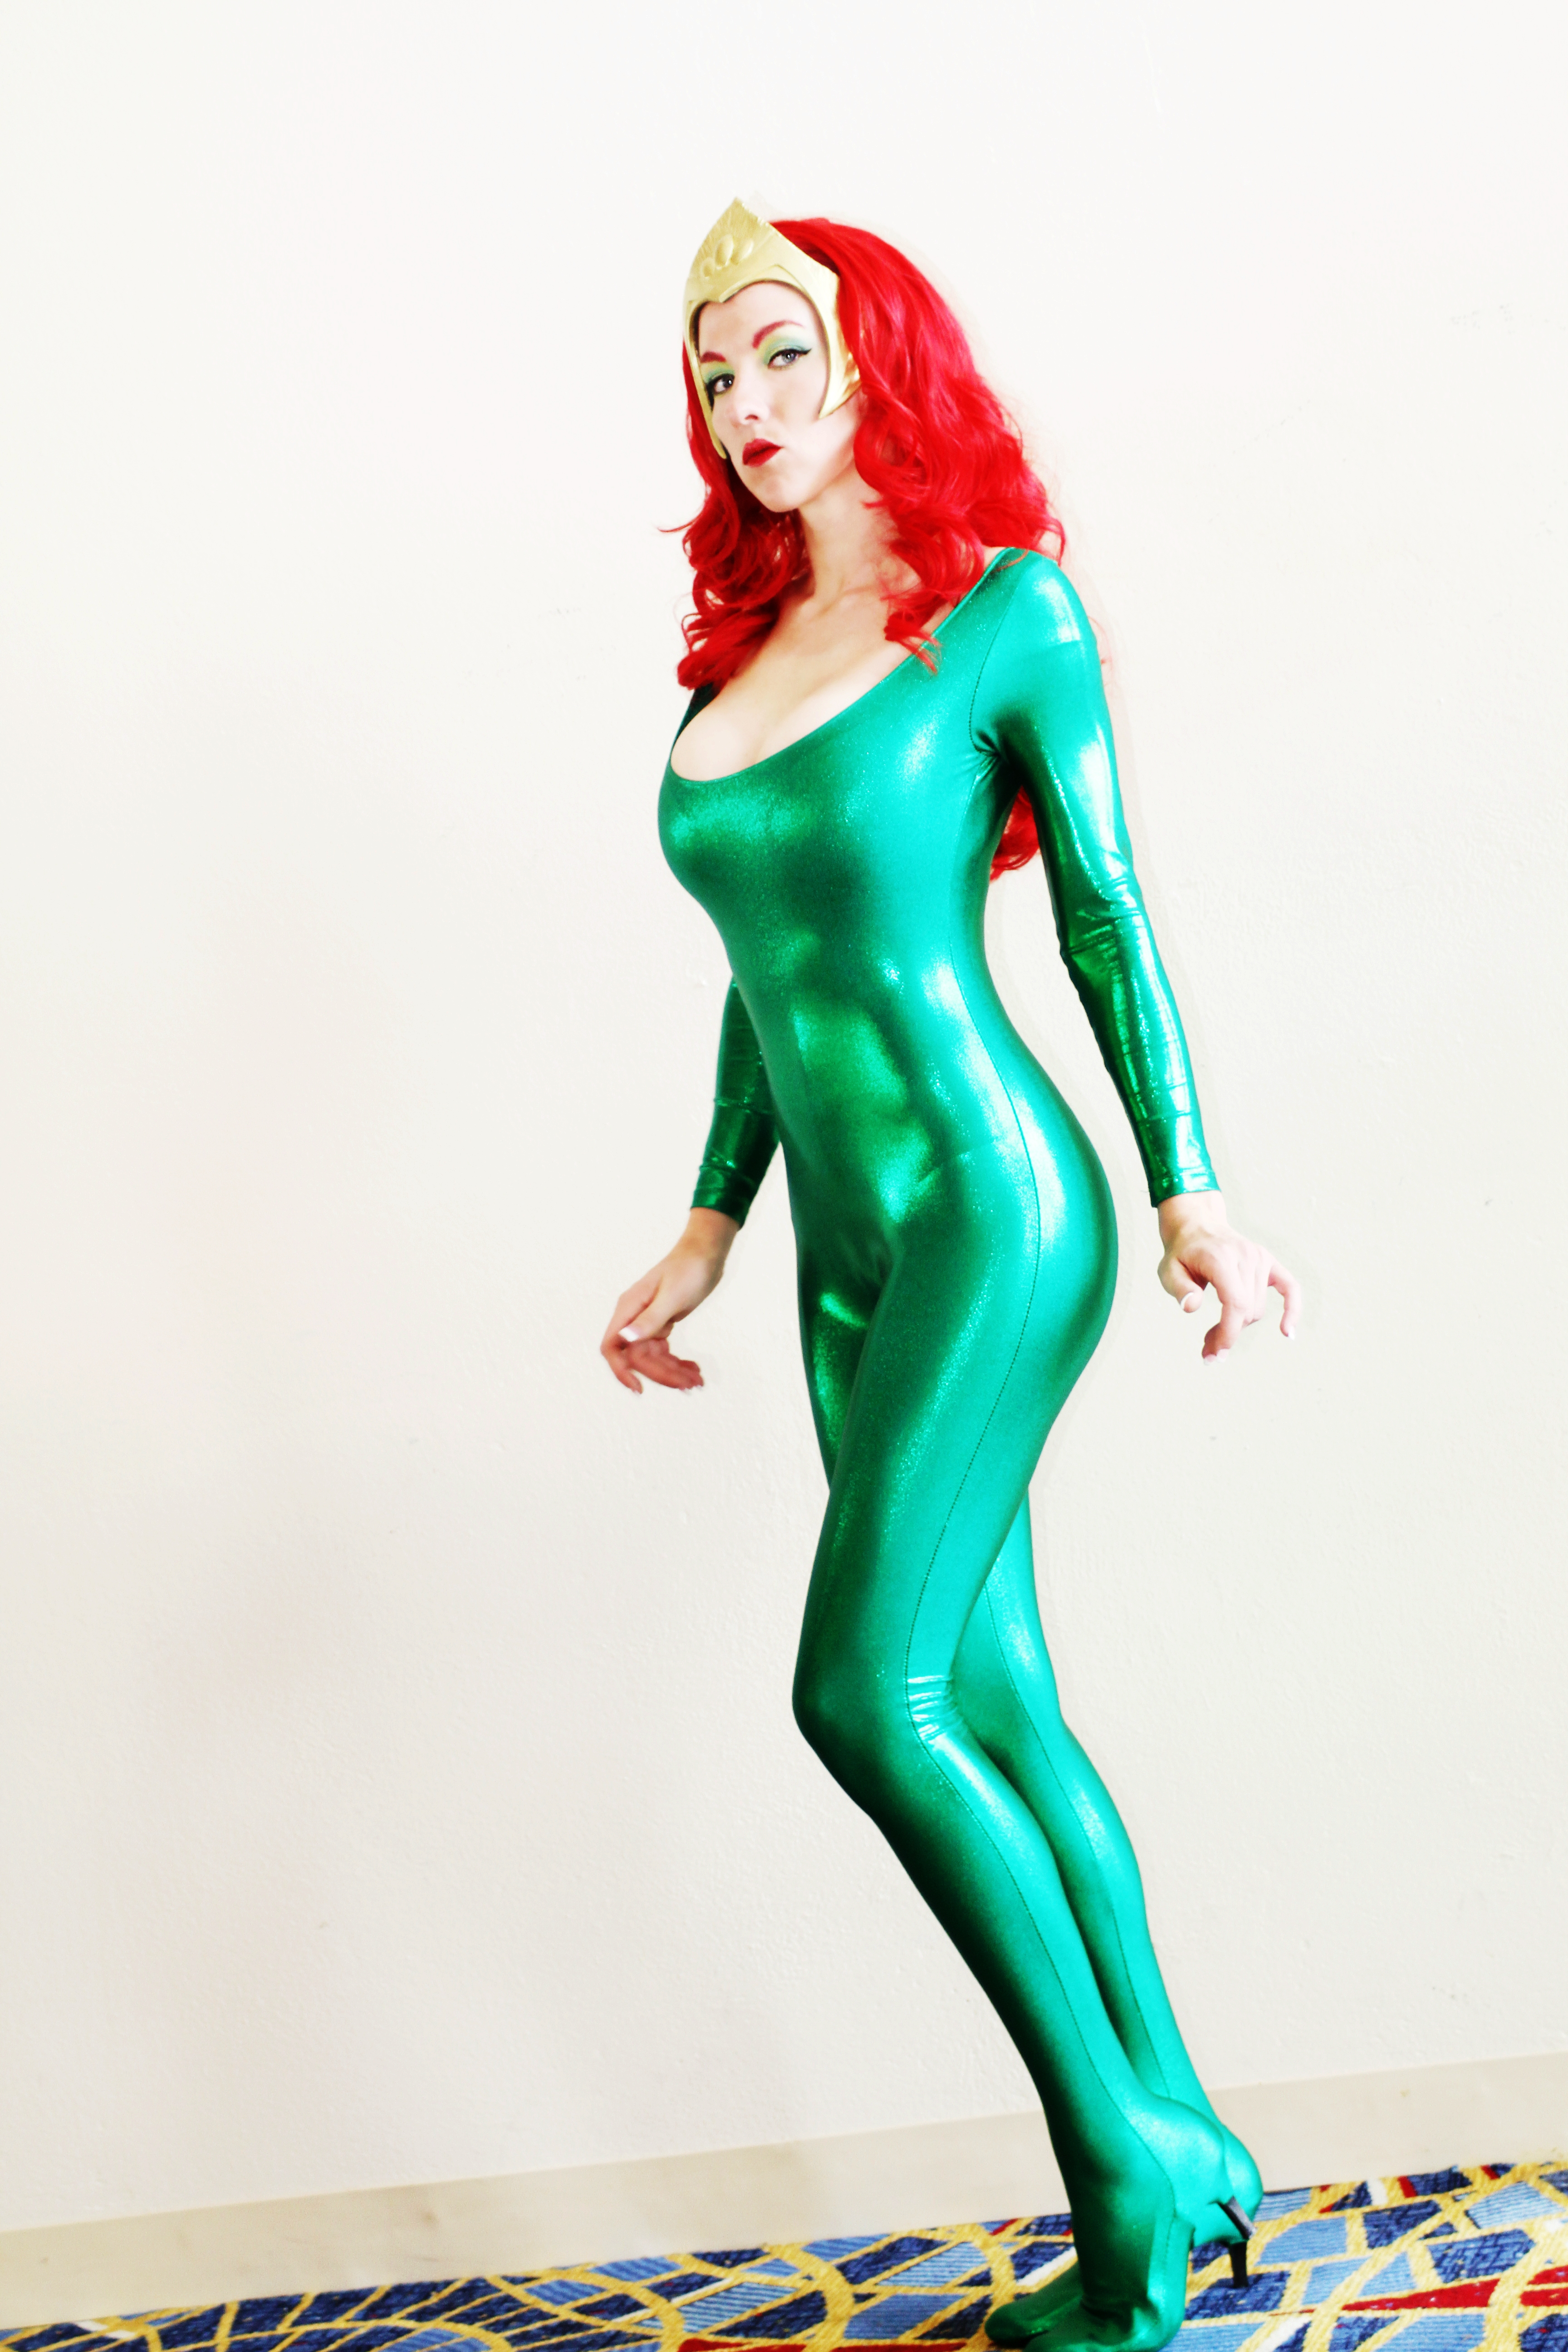 Mera - Aquaman by megmurrderher